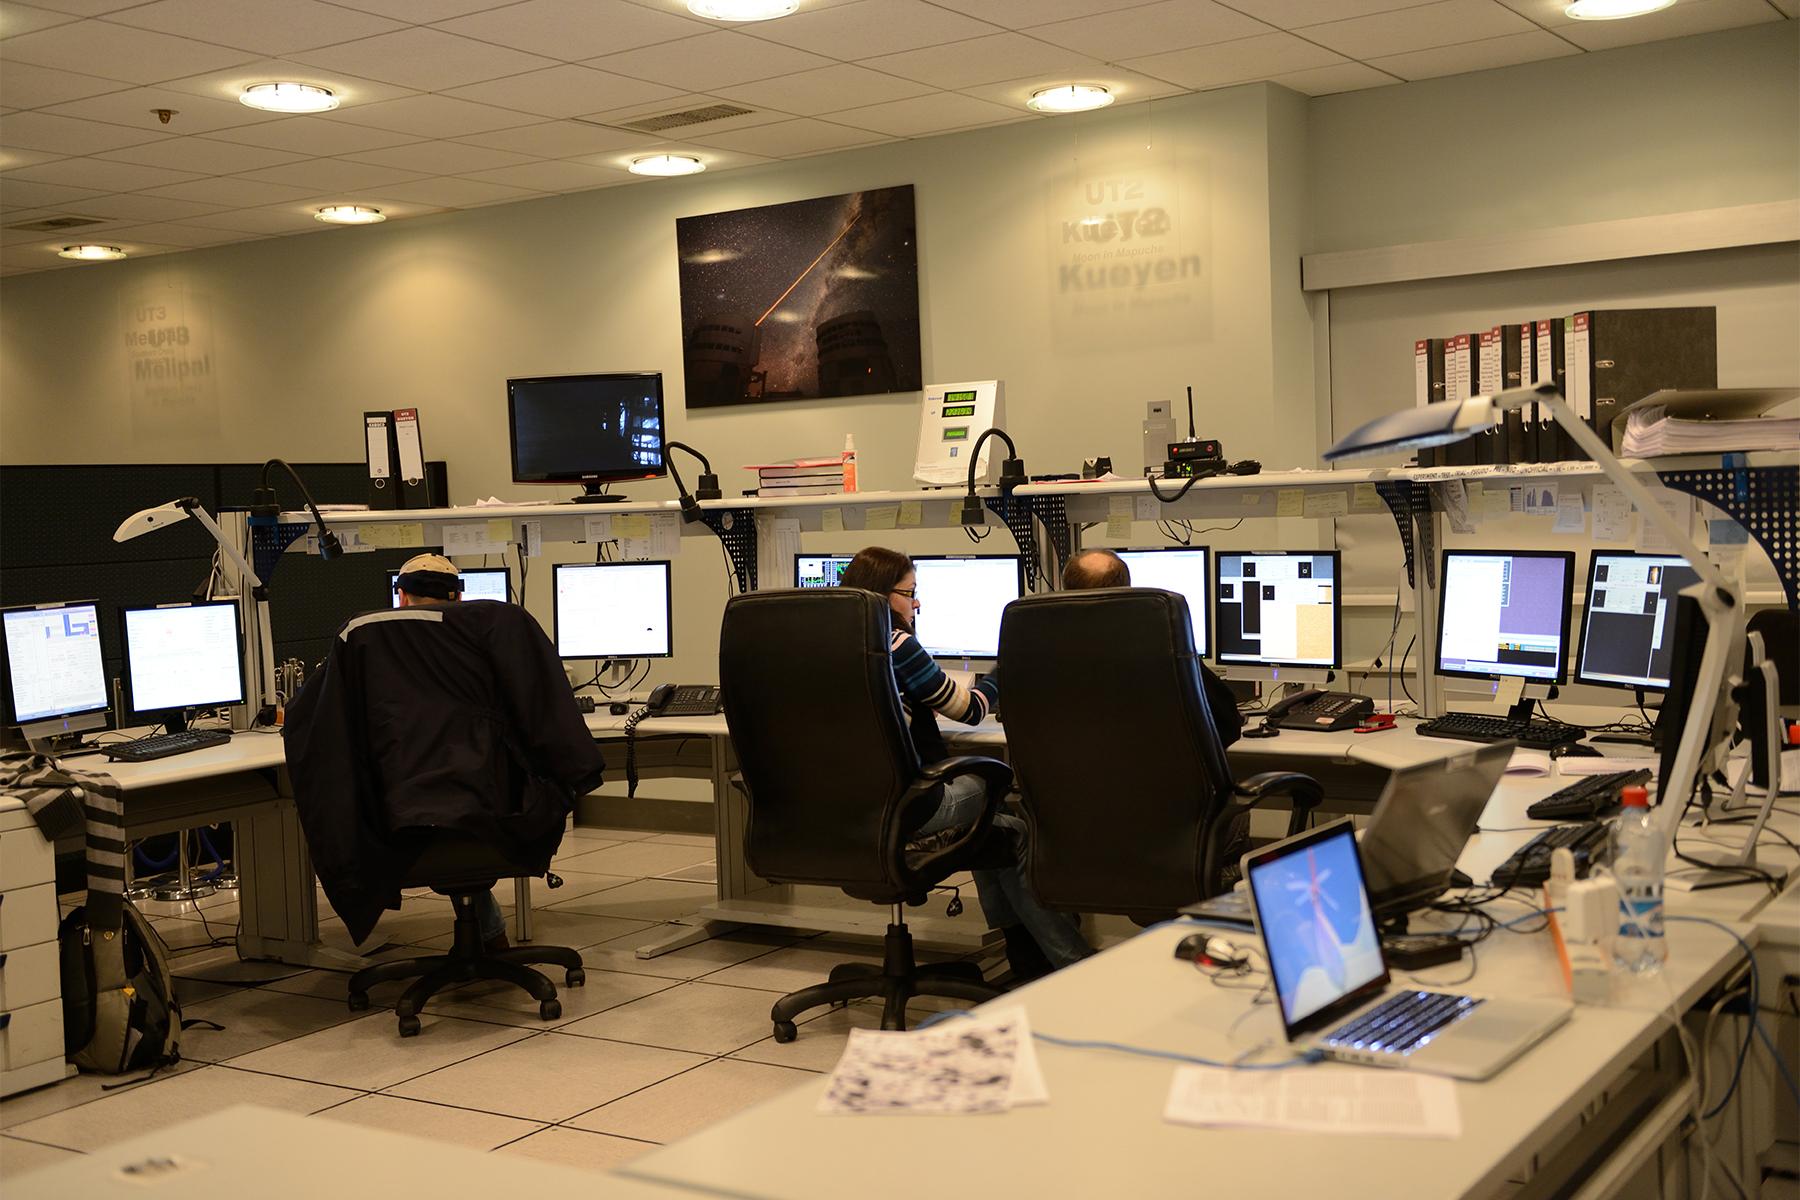 Salle de contrôle du VLT © Patricio Pardo Avalos